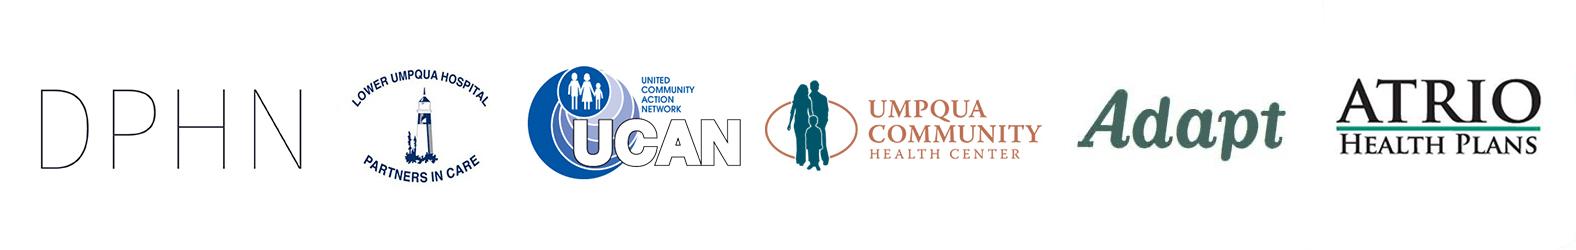 Douglas Public Health Network logo, lower umpqua hospital logo, united community action network logo, umpqua community health center logo, adapt logo, atrio health plans logo